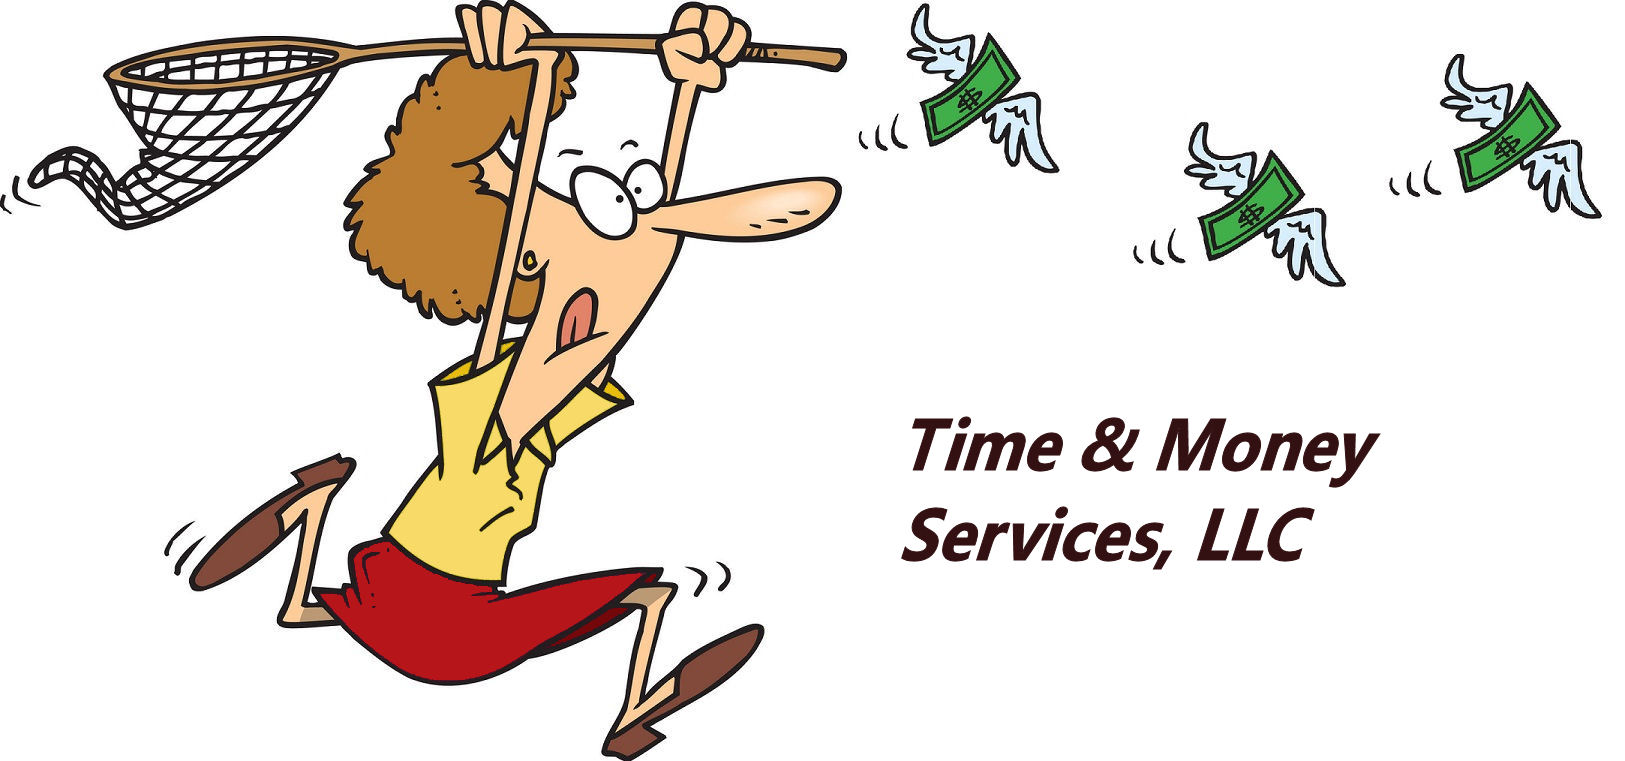 Time & Money Services, LLC